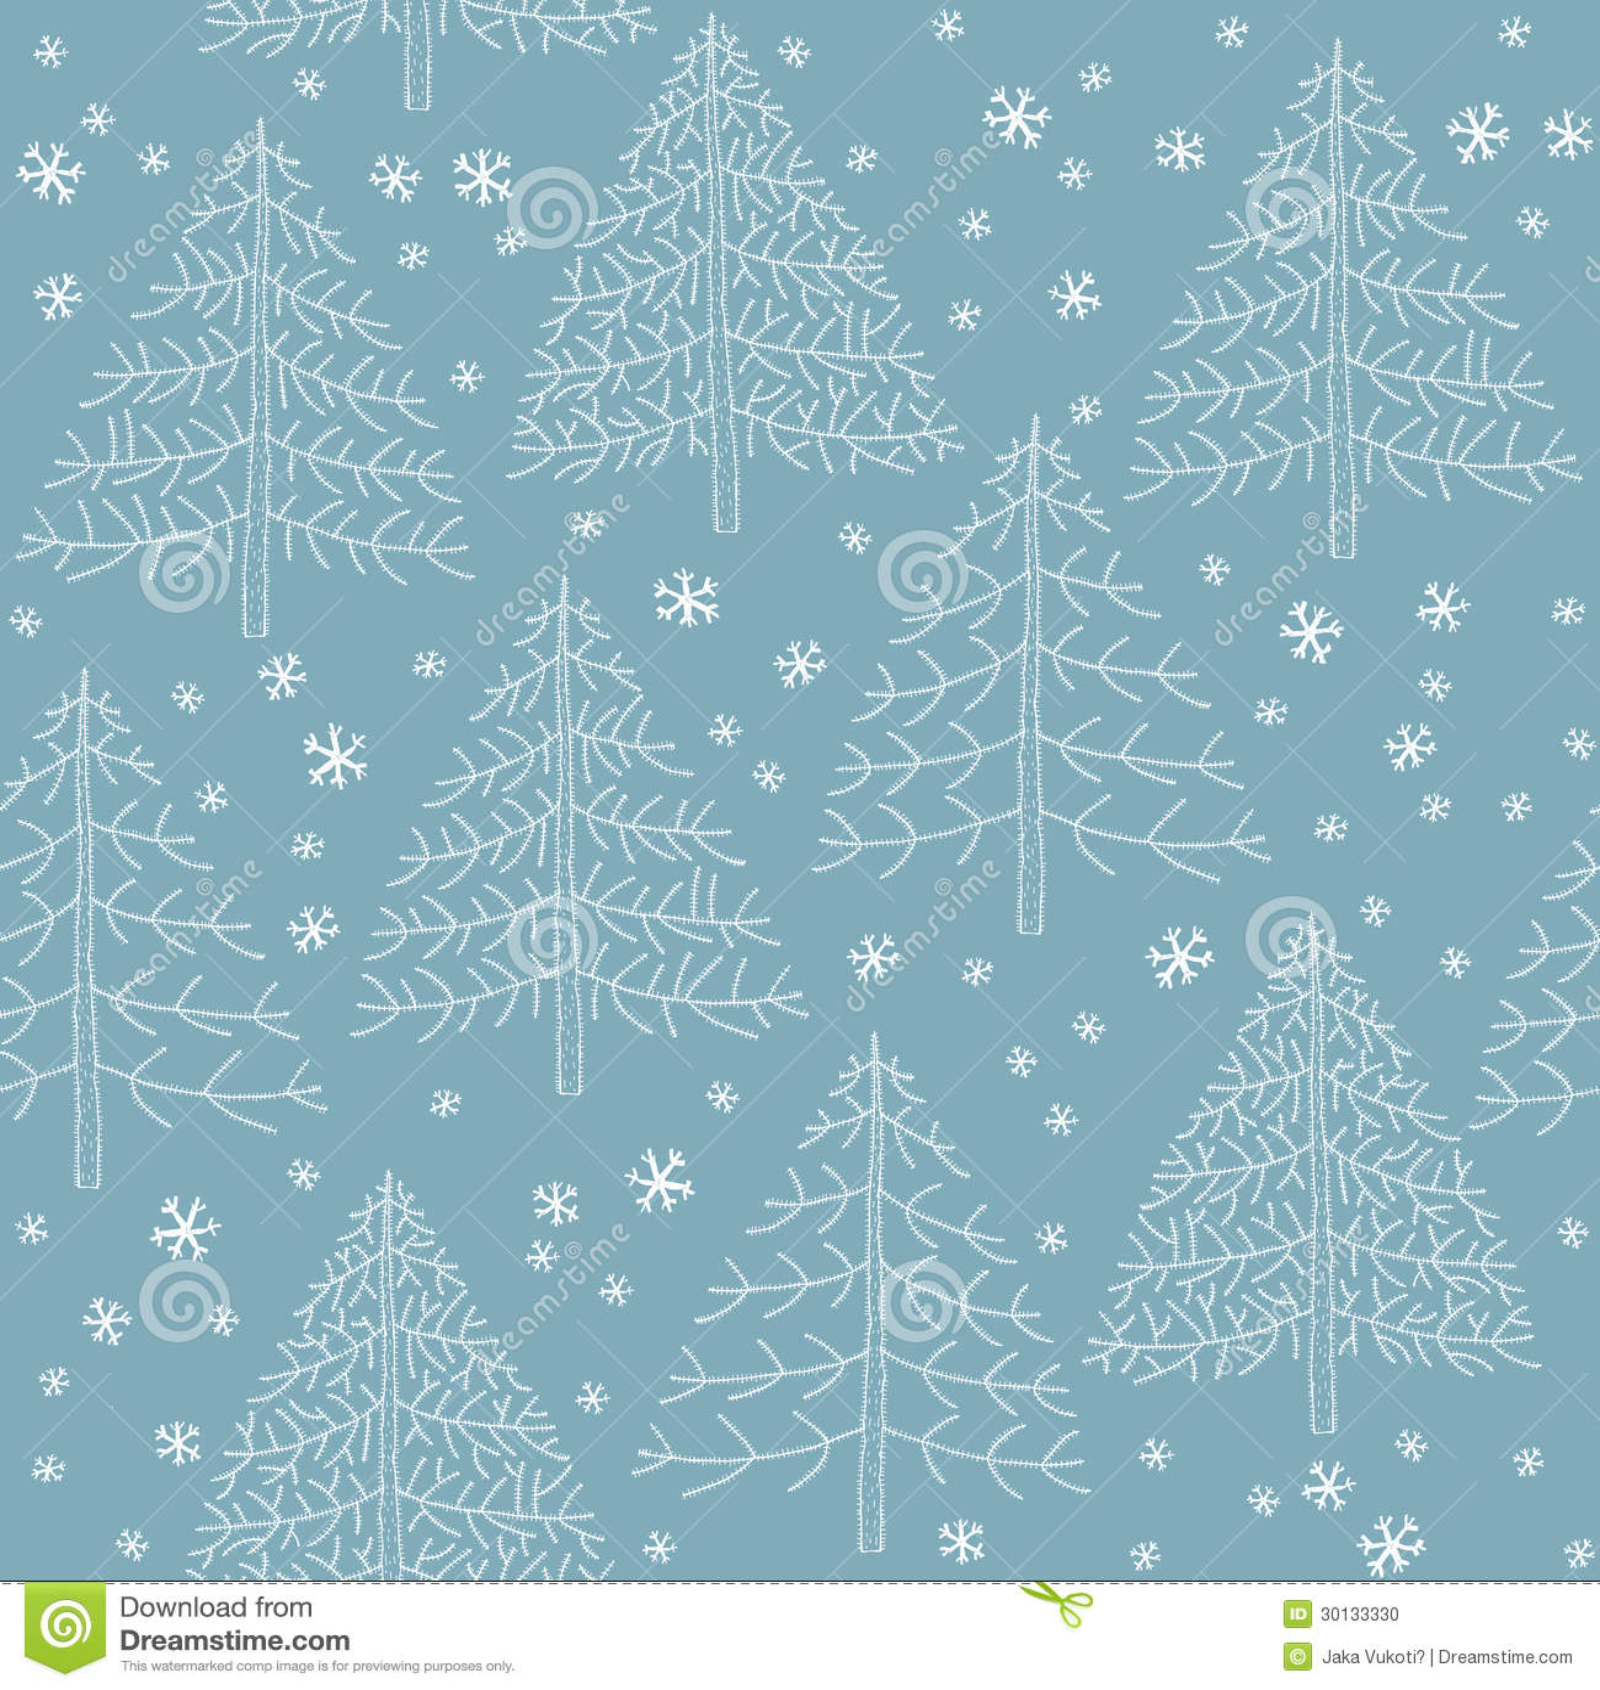 Blue Christmas Tree Wallpaper: Seamless Winter Forest Pattern Stock Photo